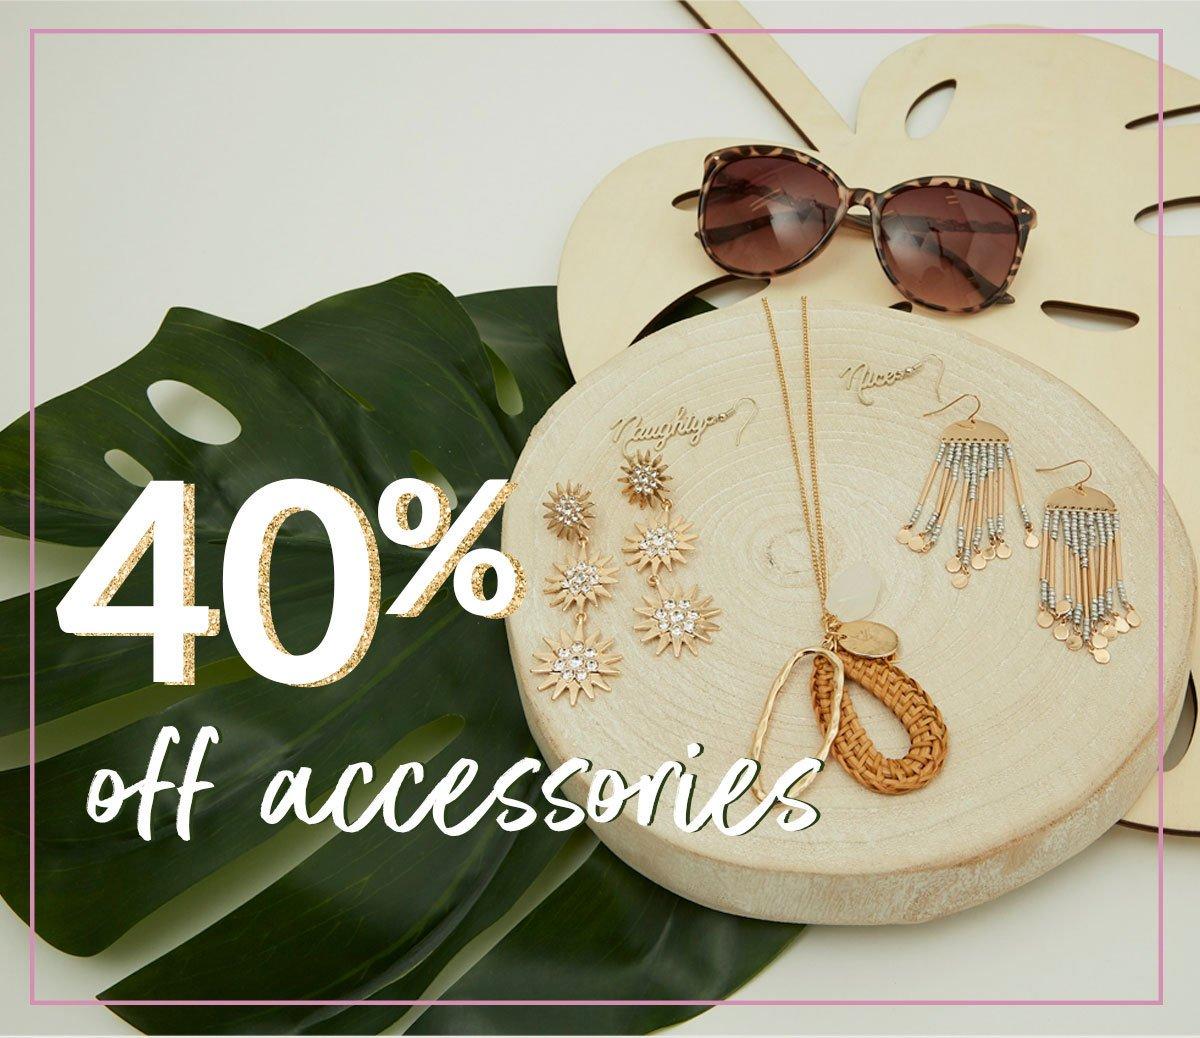 40% off accessories